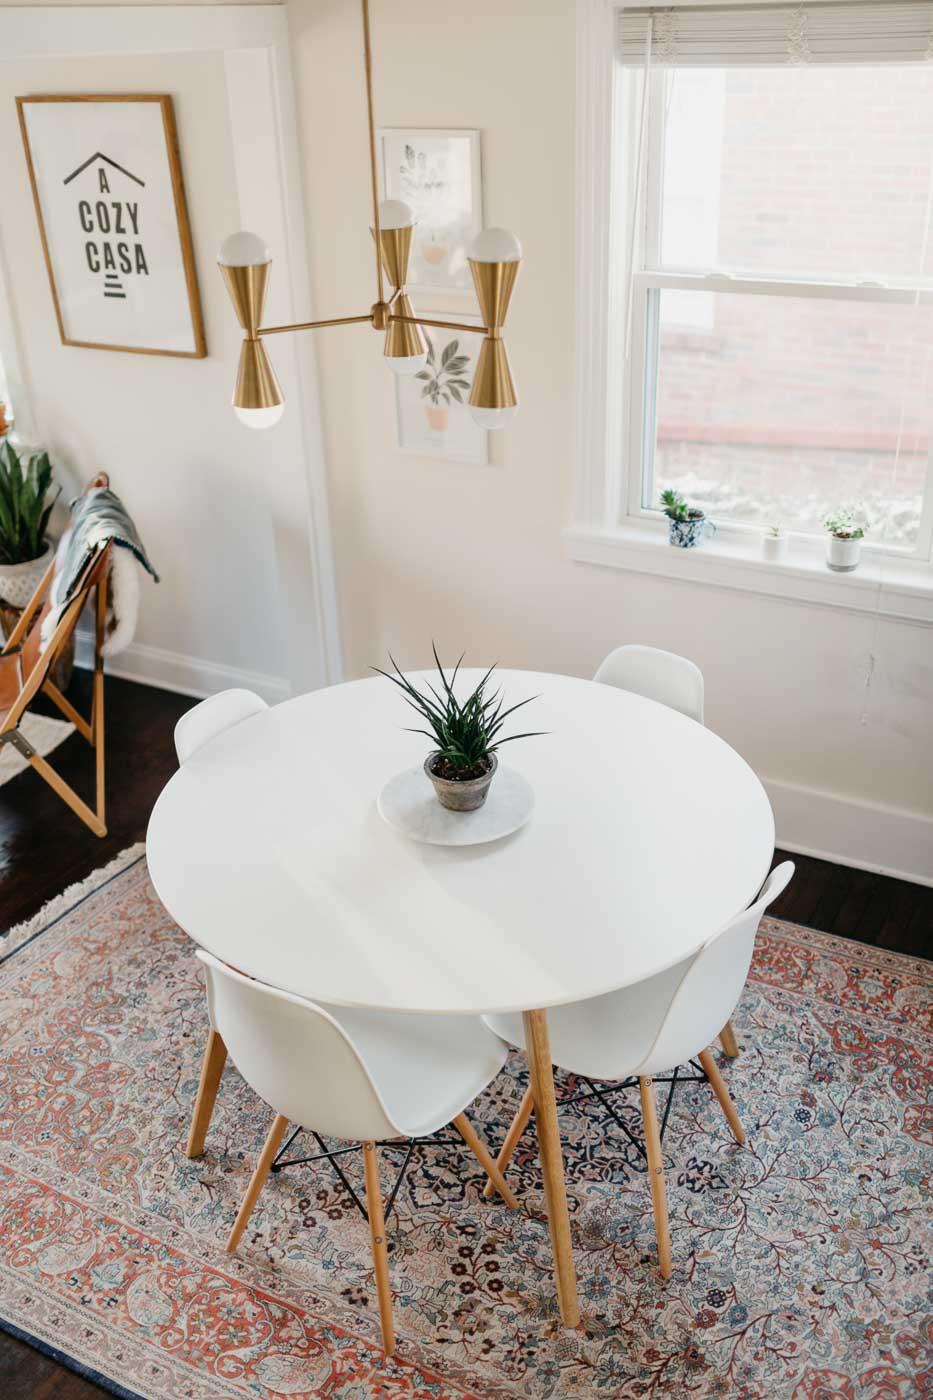 cozy-casa-nashville-tn-natural-light-studio-photography-ideas-lifestyle-photographer-photography-35.jpg